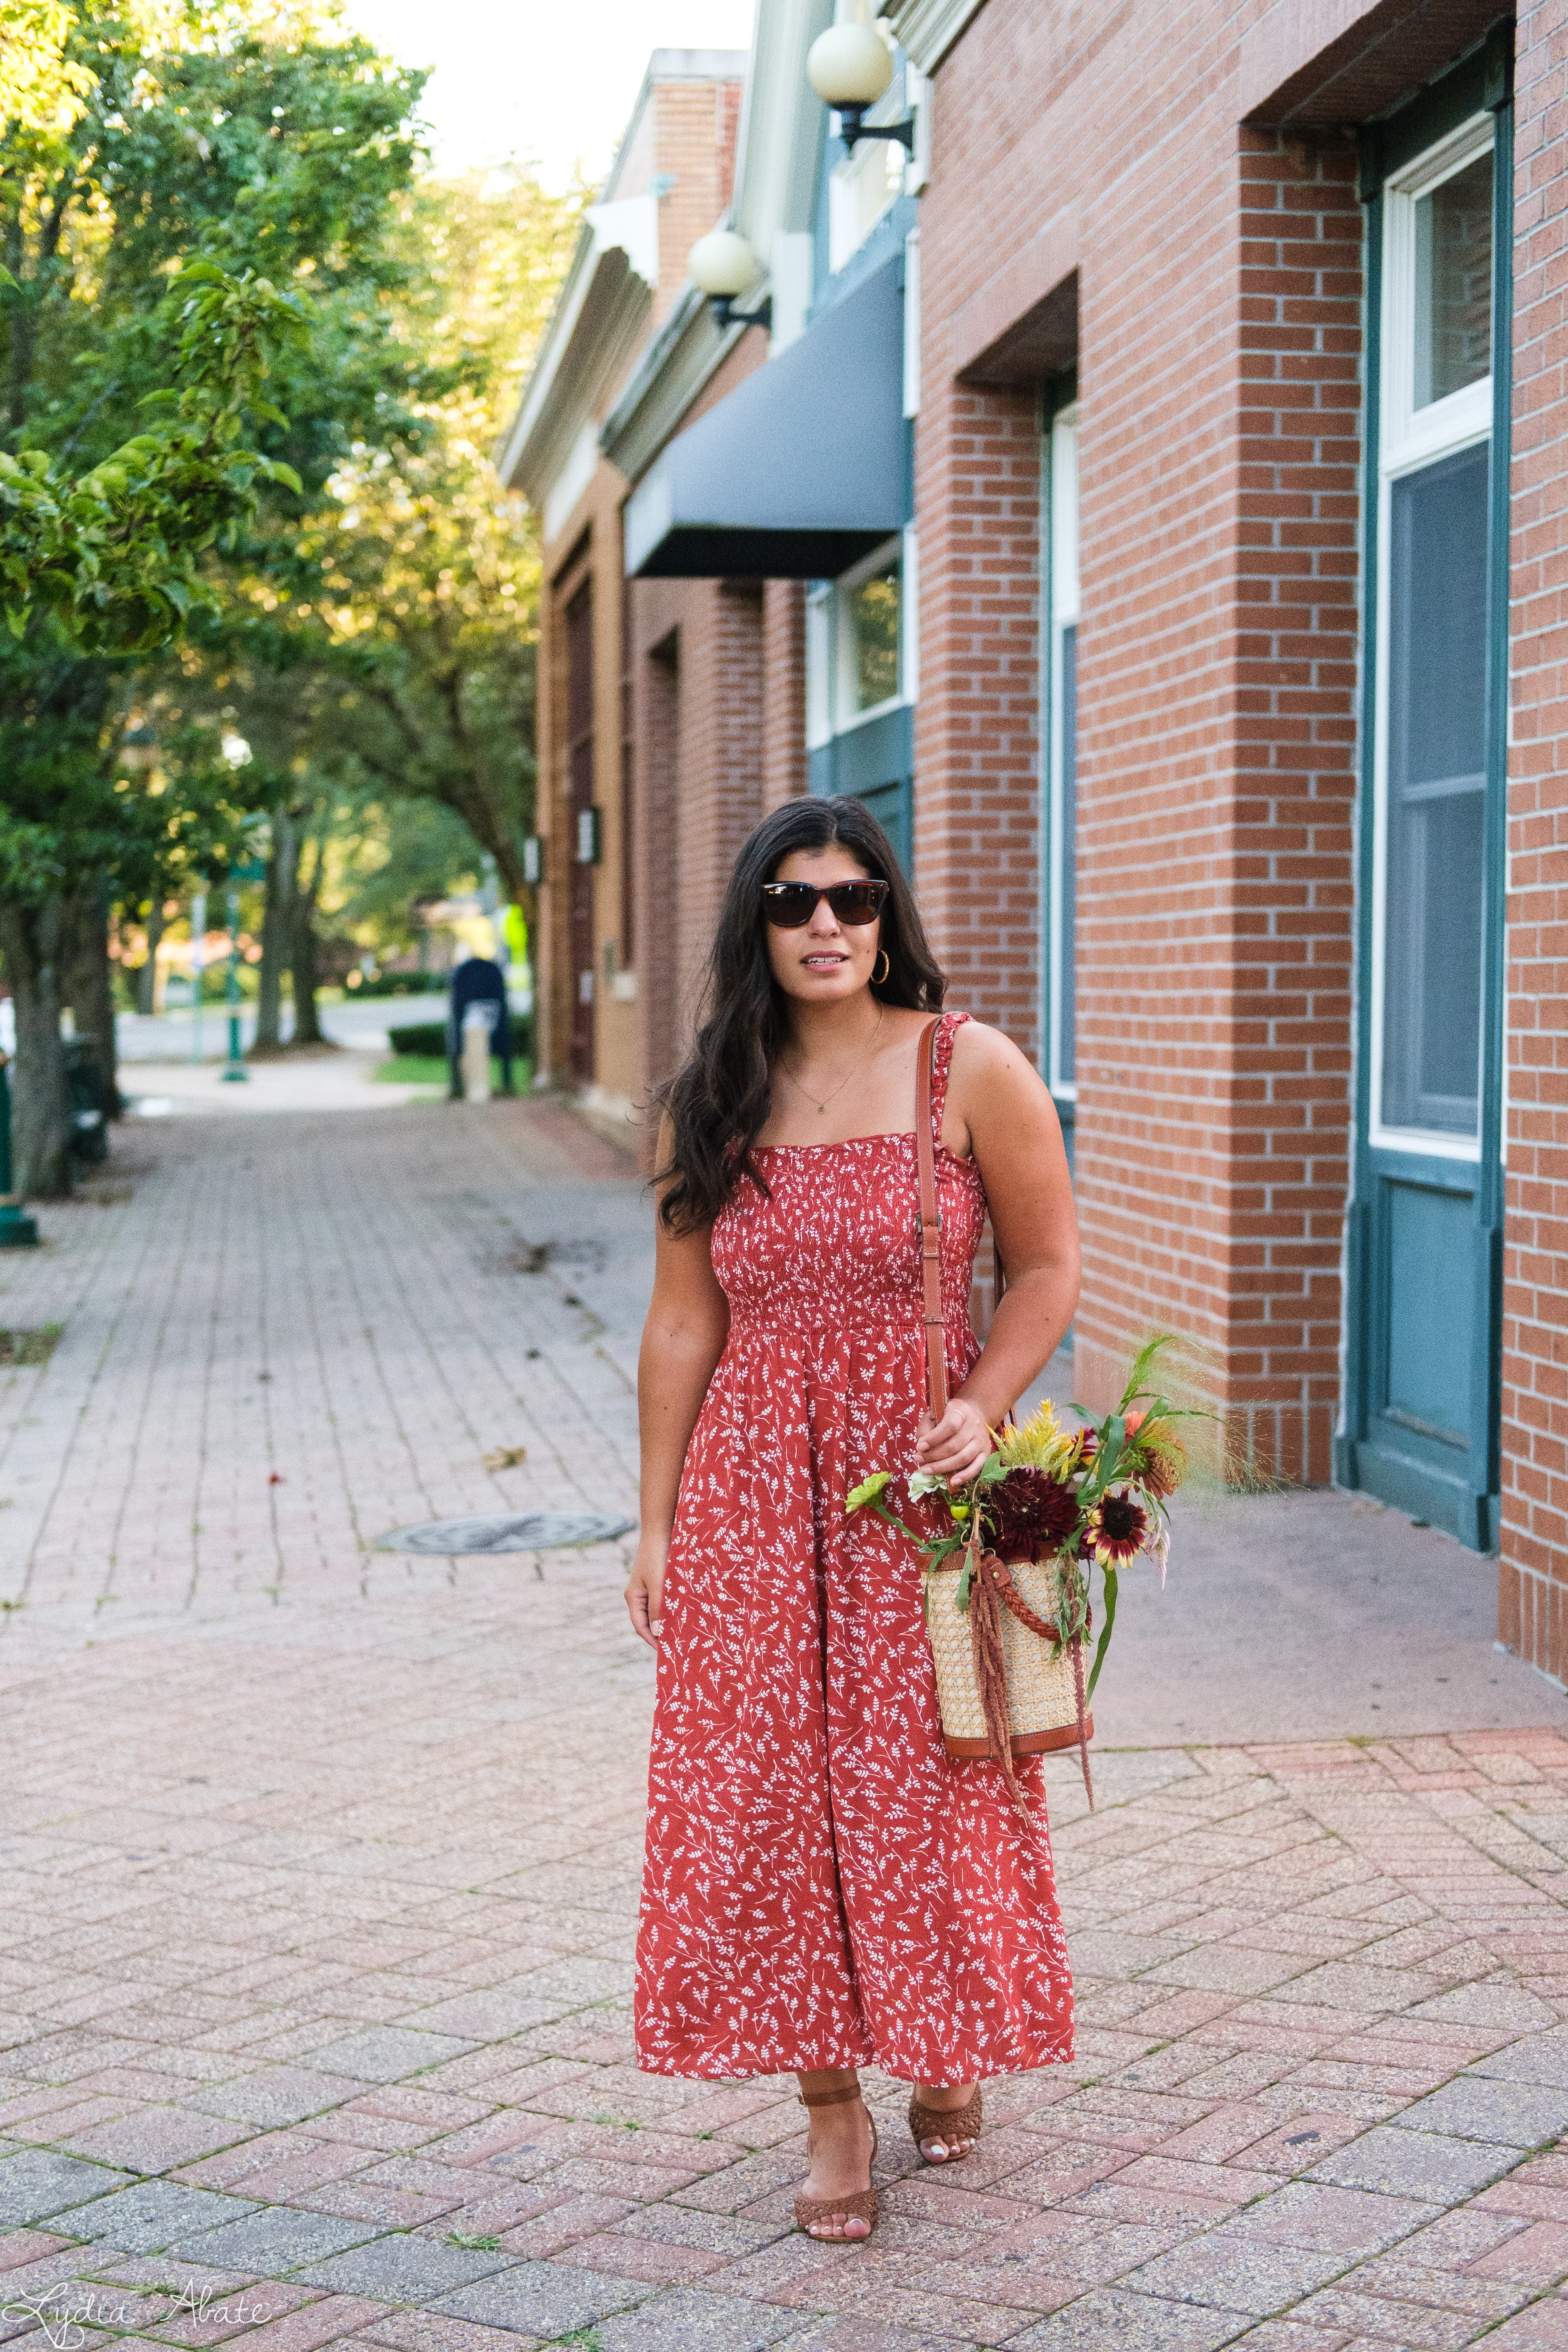 shirred rust floral maxi dress, caned bucket bag, brown sandals-1.jpg